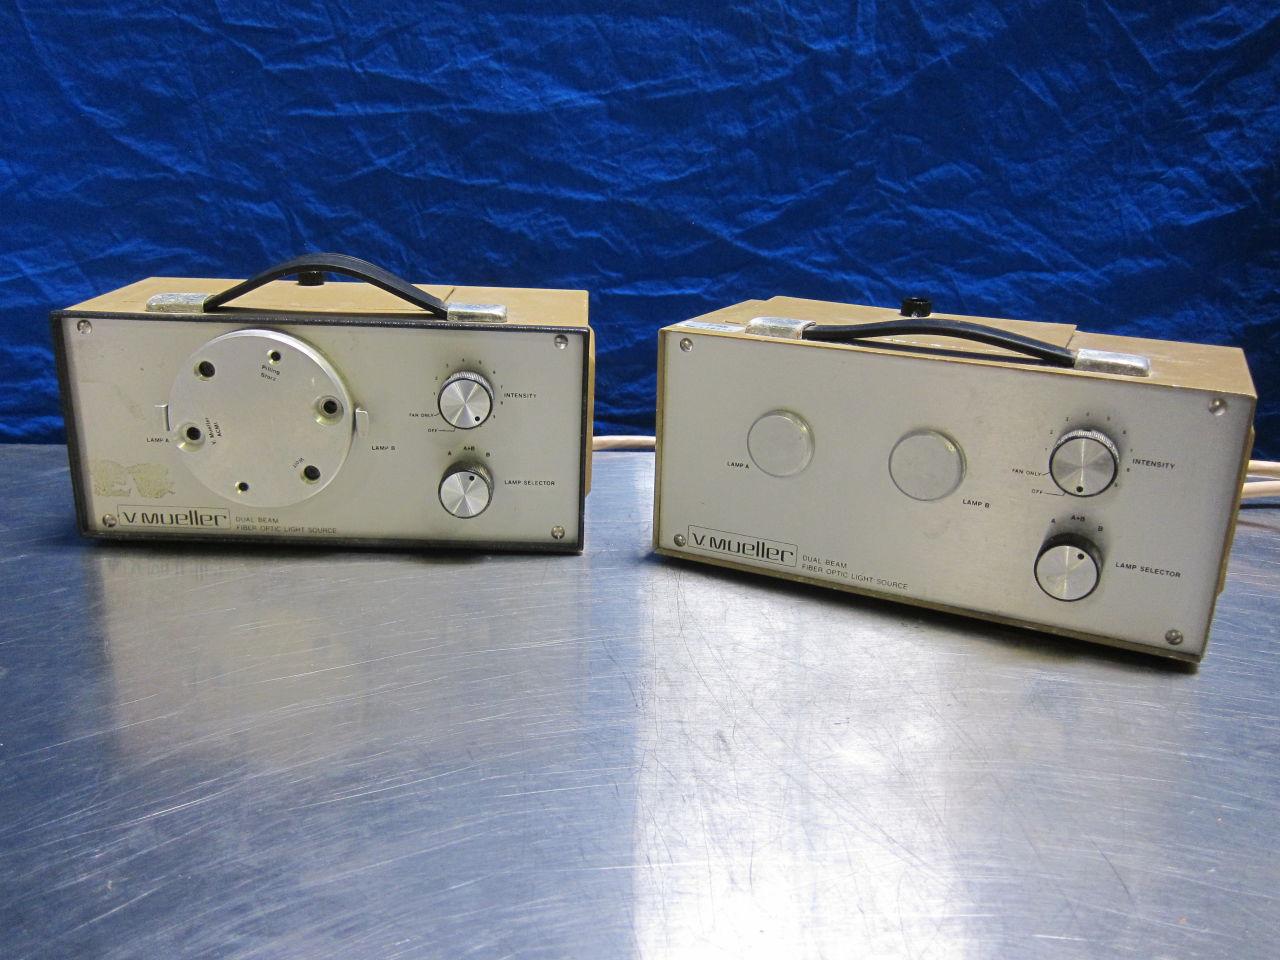 V. MUELLER Dual Beam  - Lot of 2 Light Source